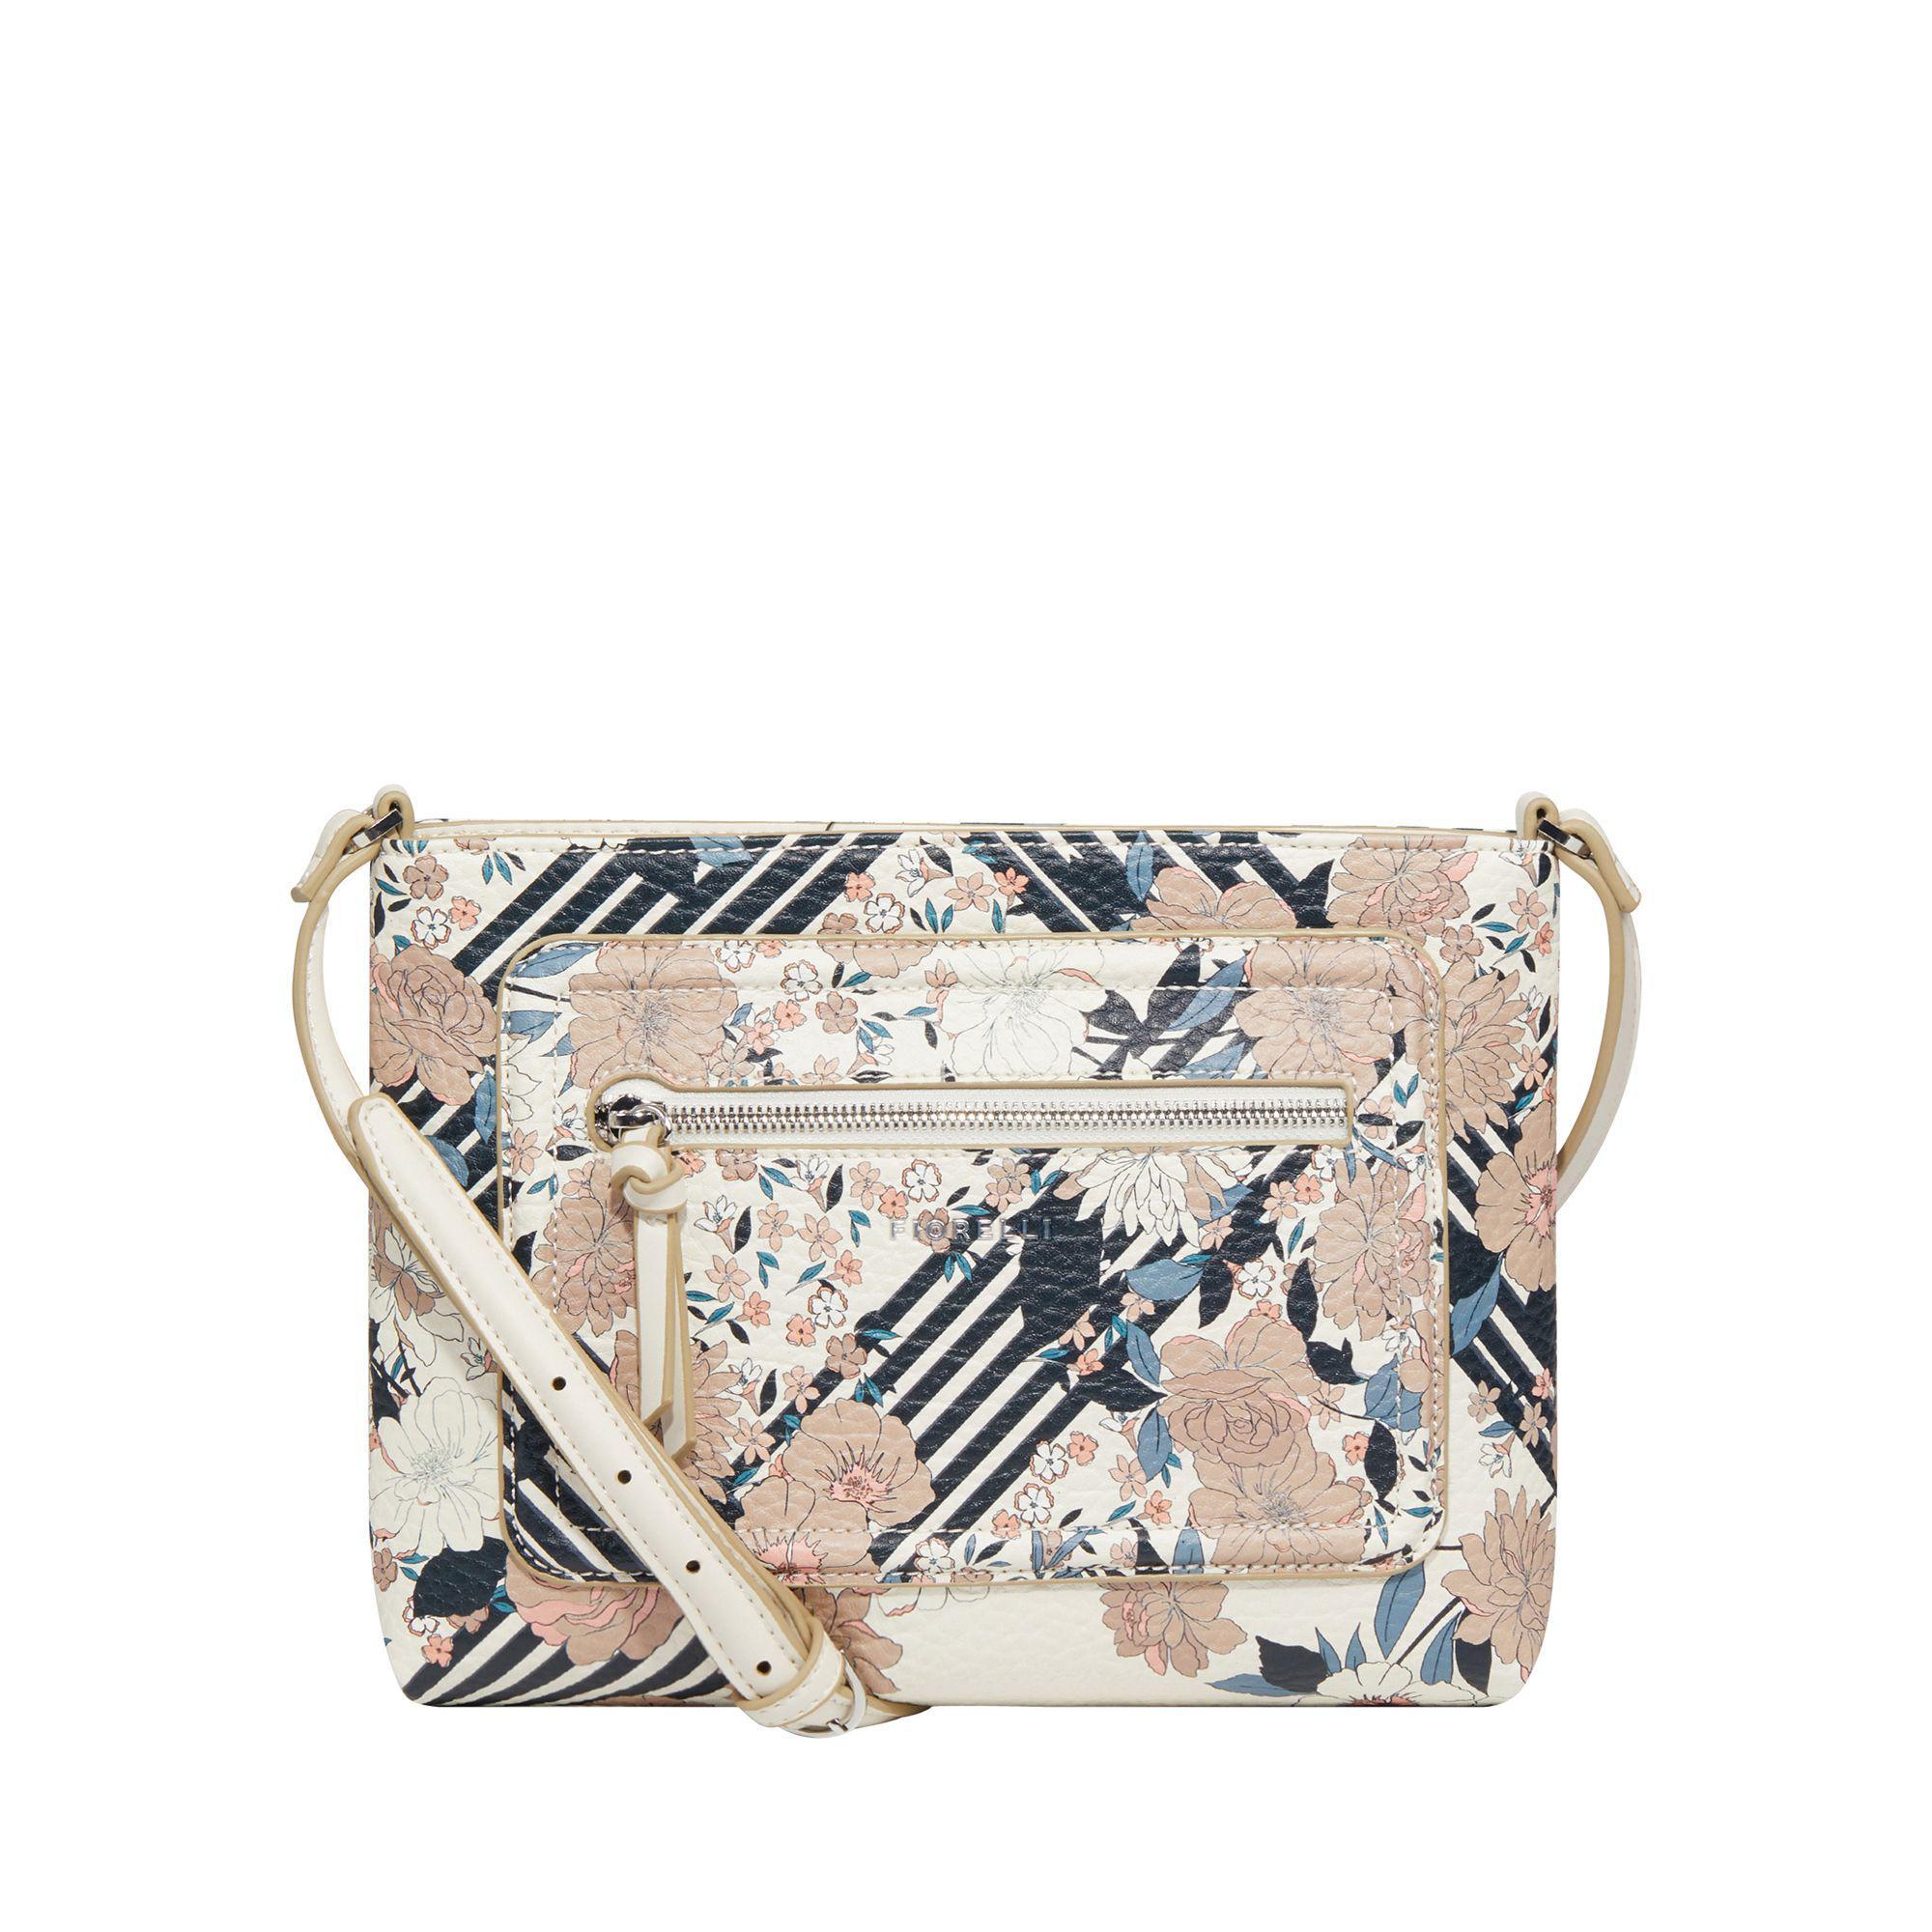 Fiorelli Multi-coloured Floral Print 'bella' Slim Crossbody Bag